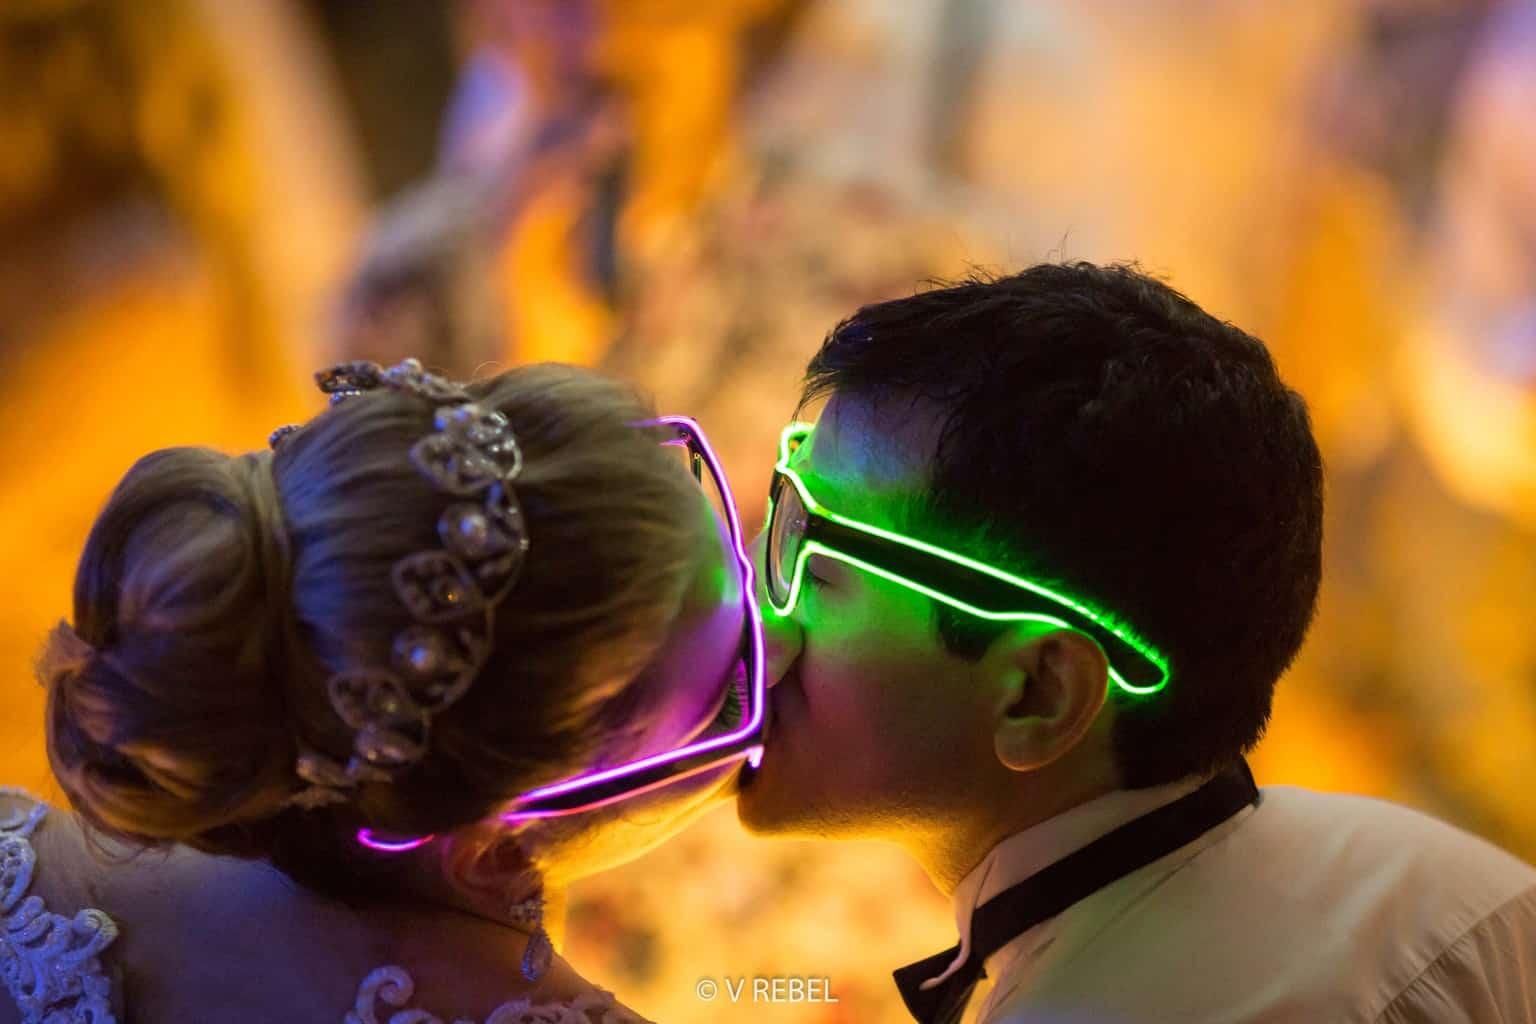 casamento-Caroline-e-Breno-casamento-clássico-fotografia-VRebel-noivos-na-pista-pista107